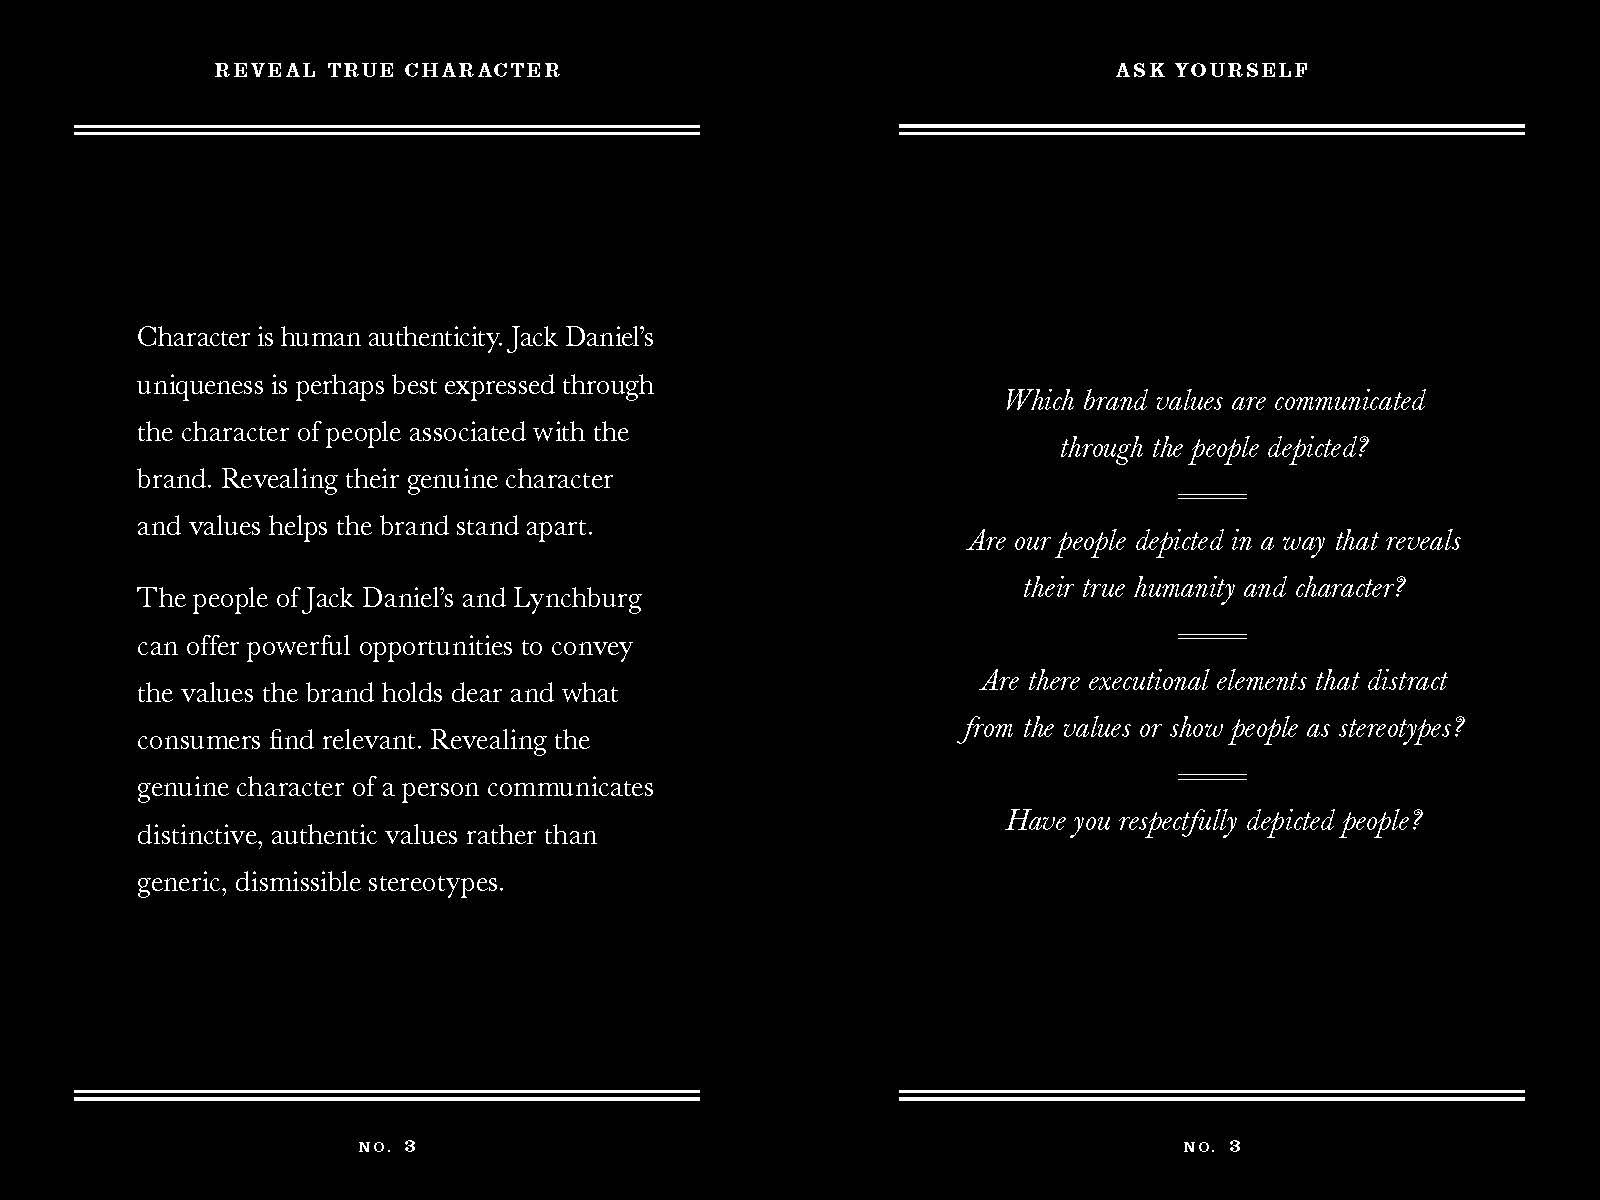 Jack Daniel's Guiding Principles 2012_Page_23.jpg